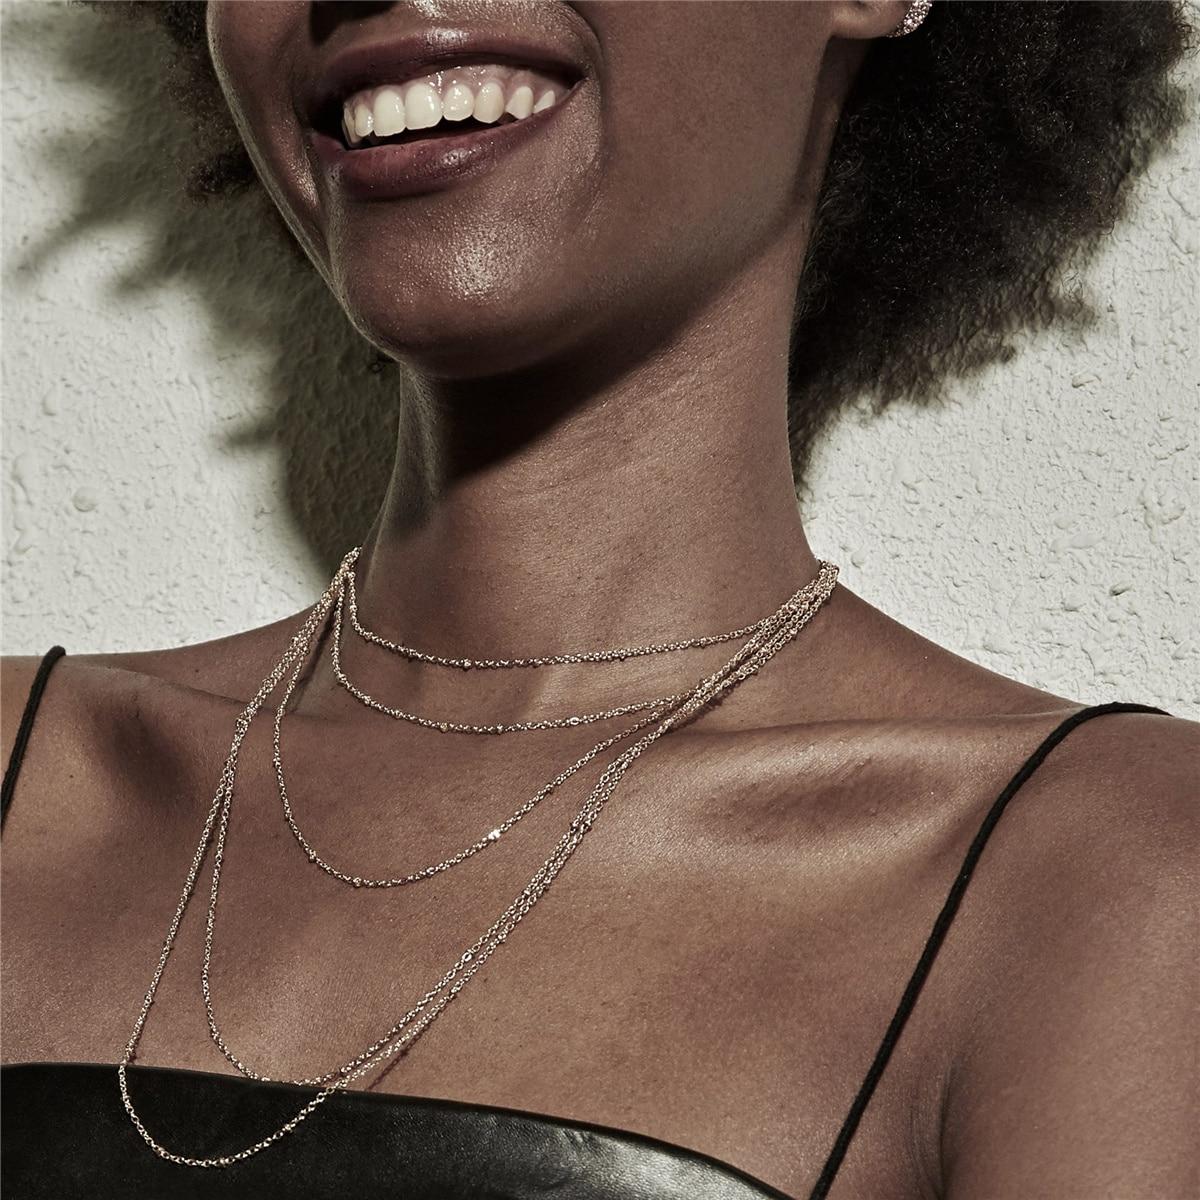 Hip hop cubana borla gargantilha colar colar declaração feminina festival jóias punk rock multi camada corrente de ferro colar steampunk